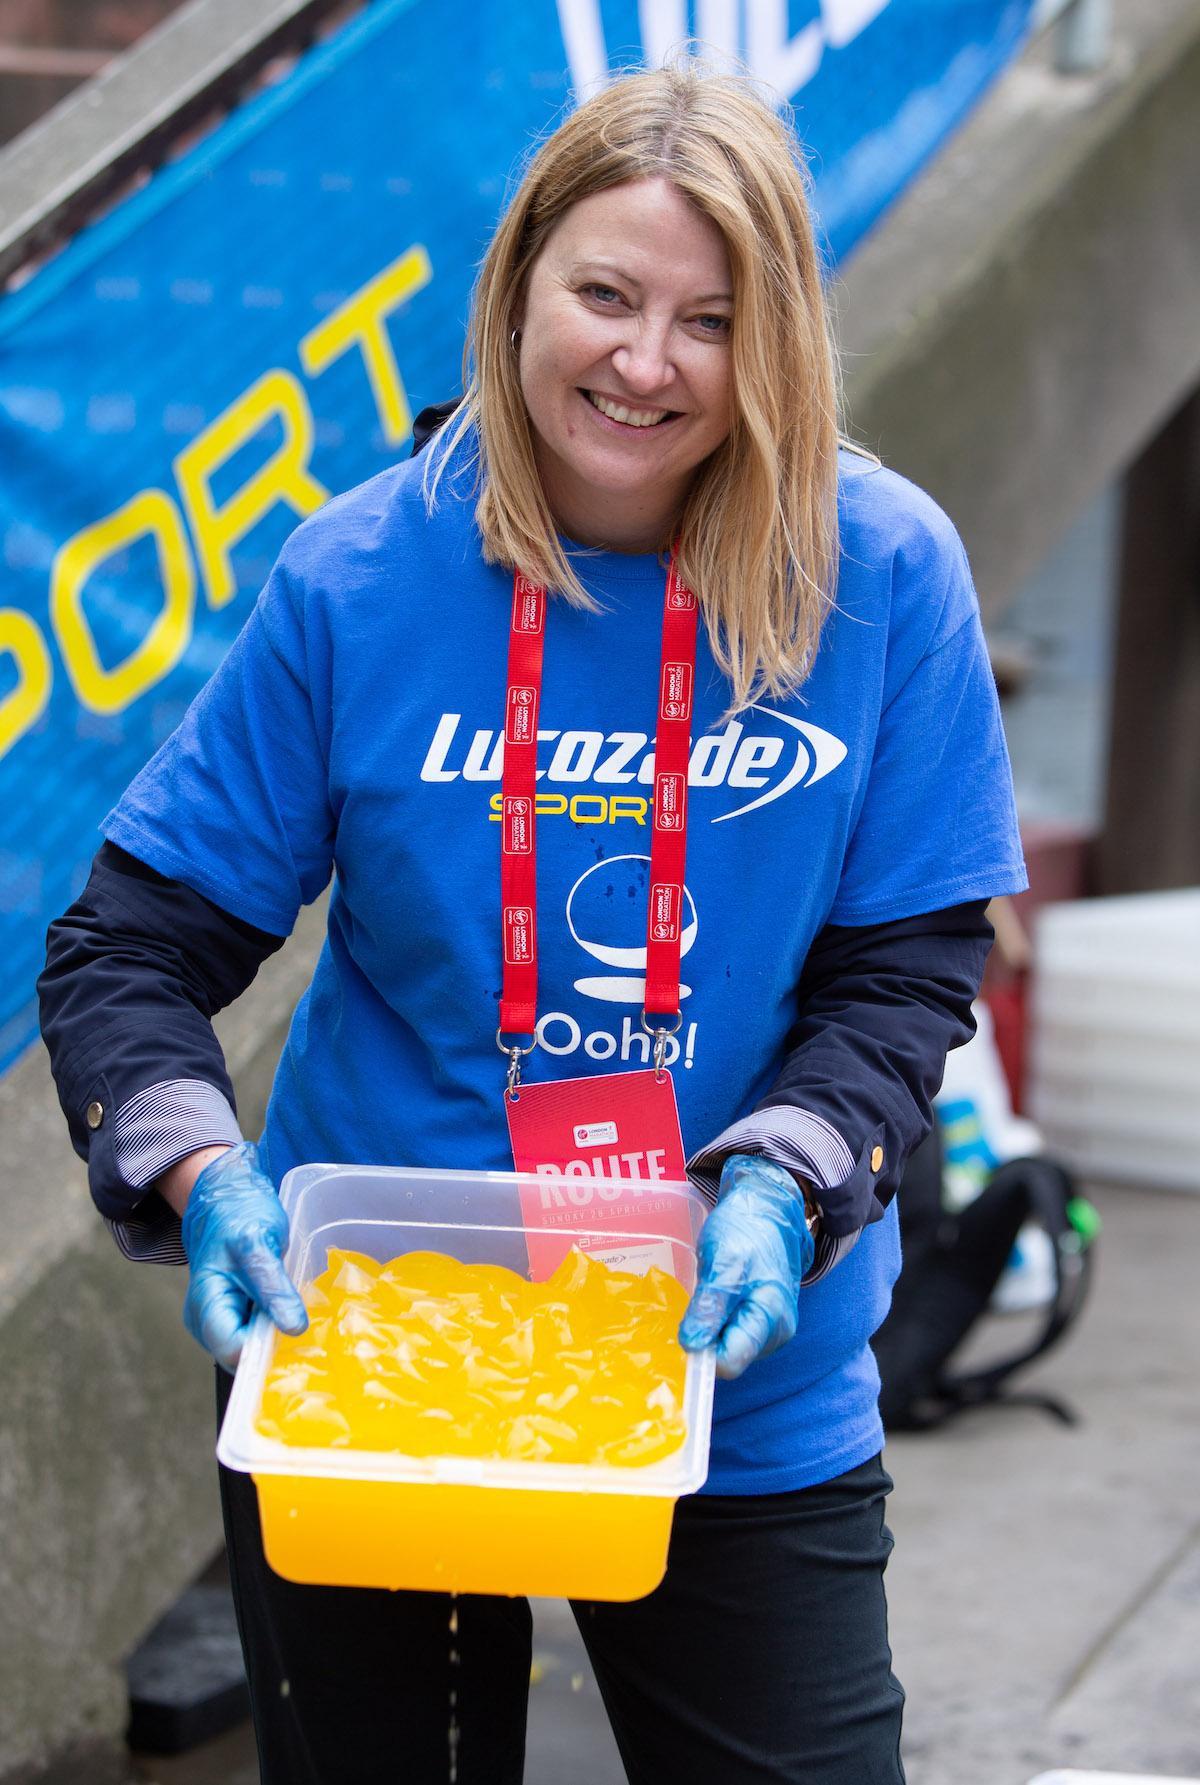 Lucozade-Sport-Ooho-2019-London-Marathon-1556550599547.jpg